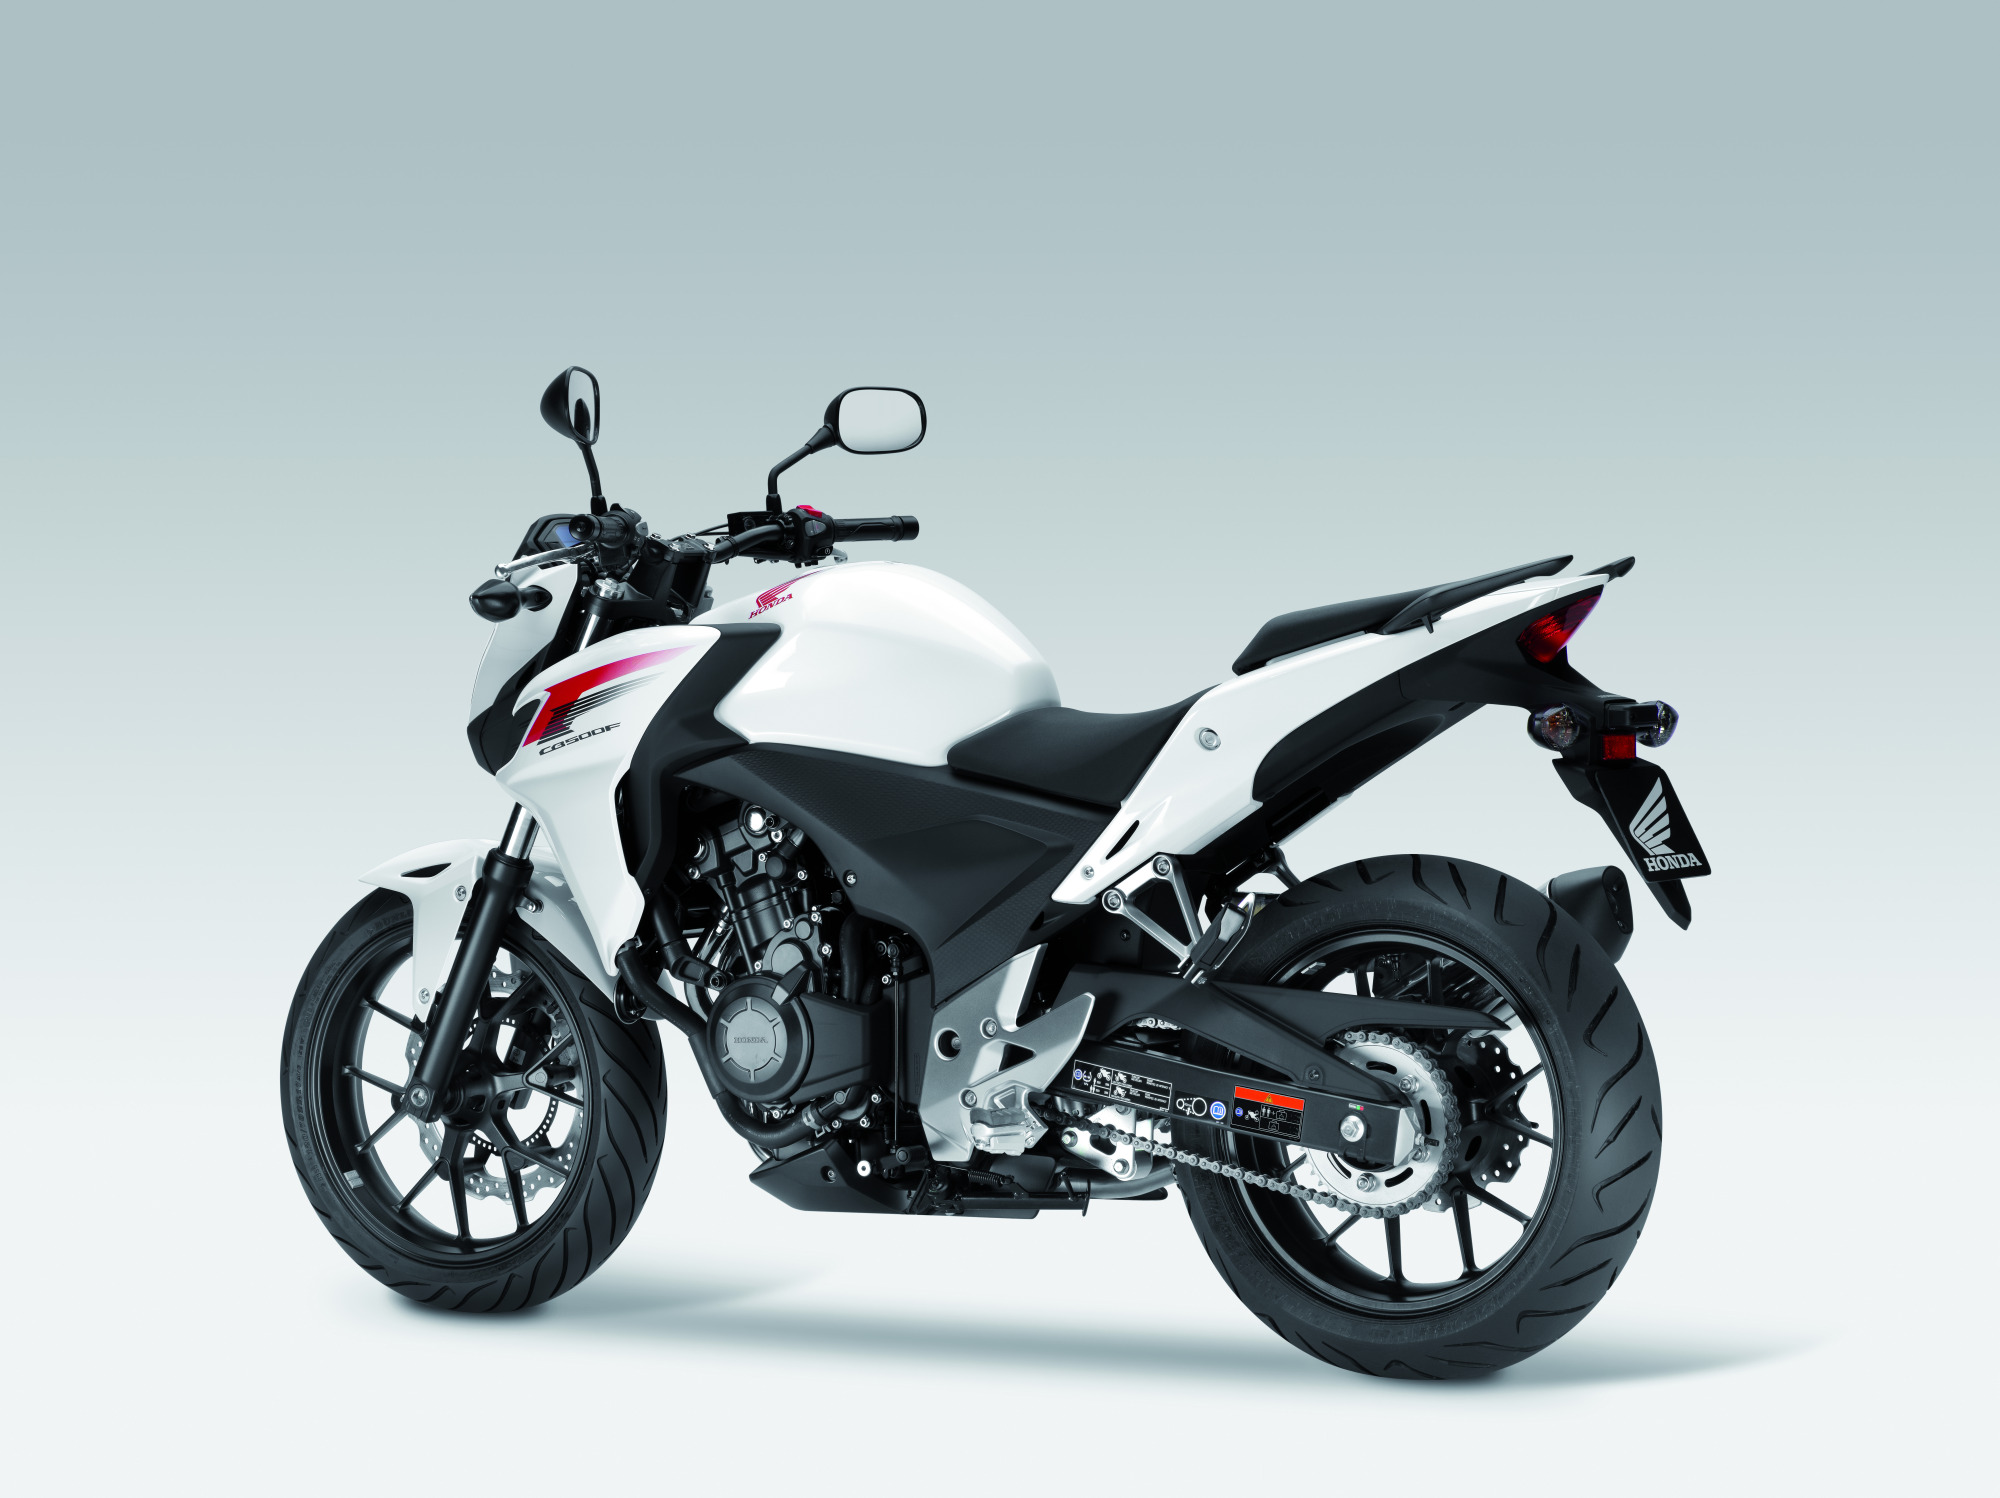 2013 Honda CB 500 F ABS: pics, specs and information